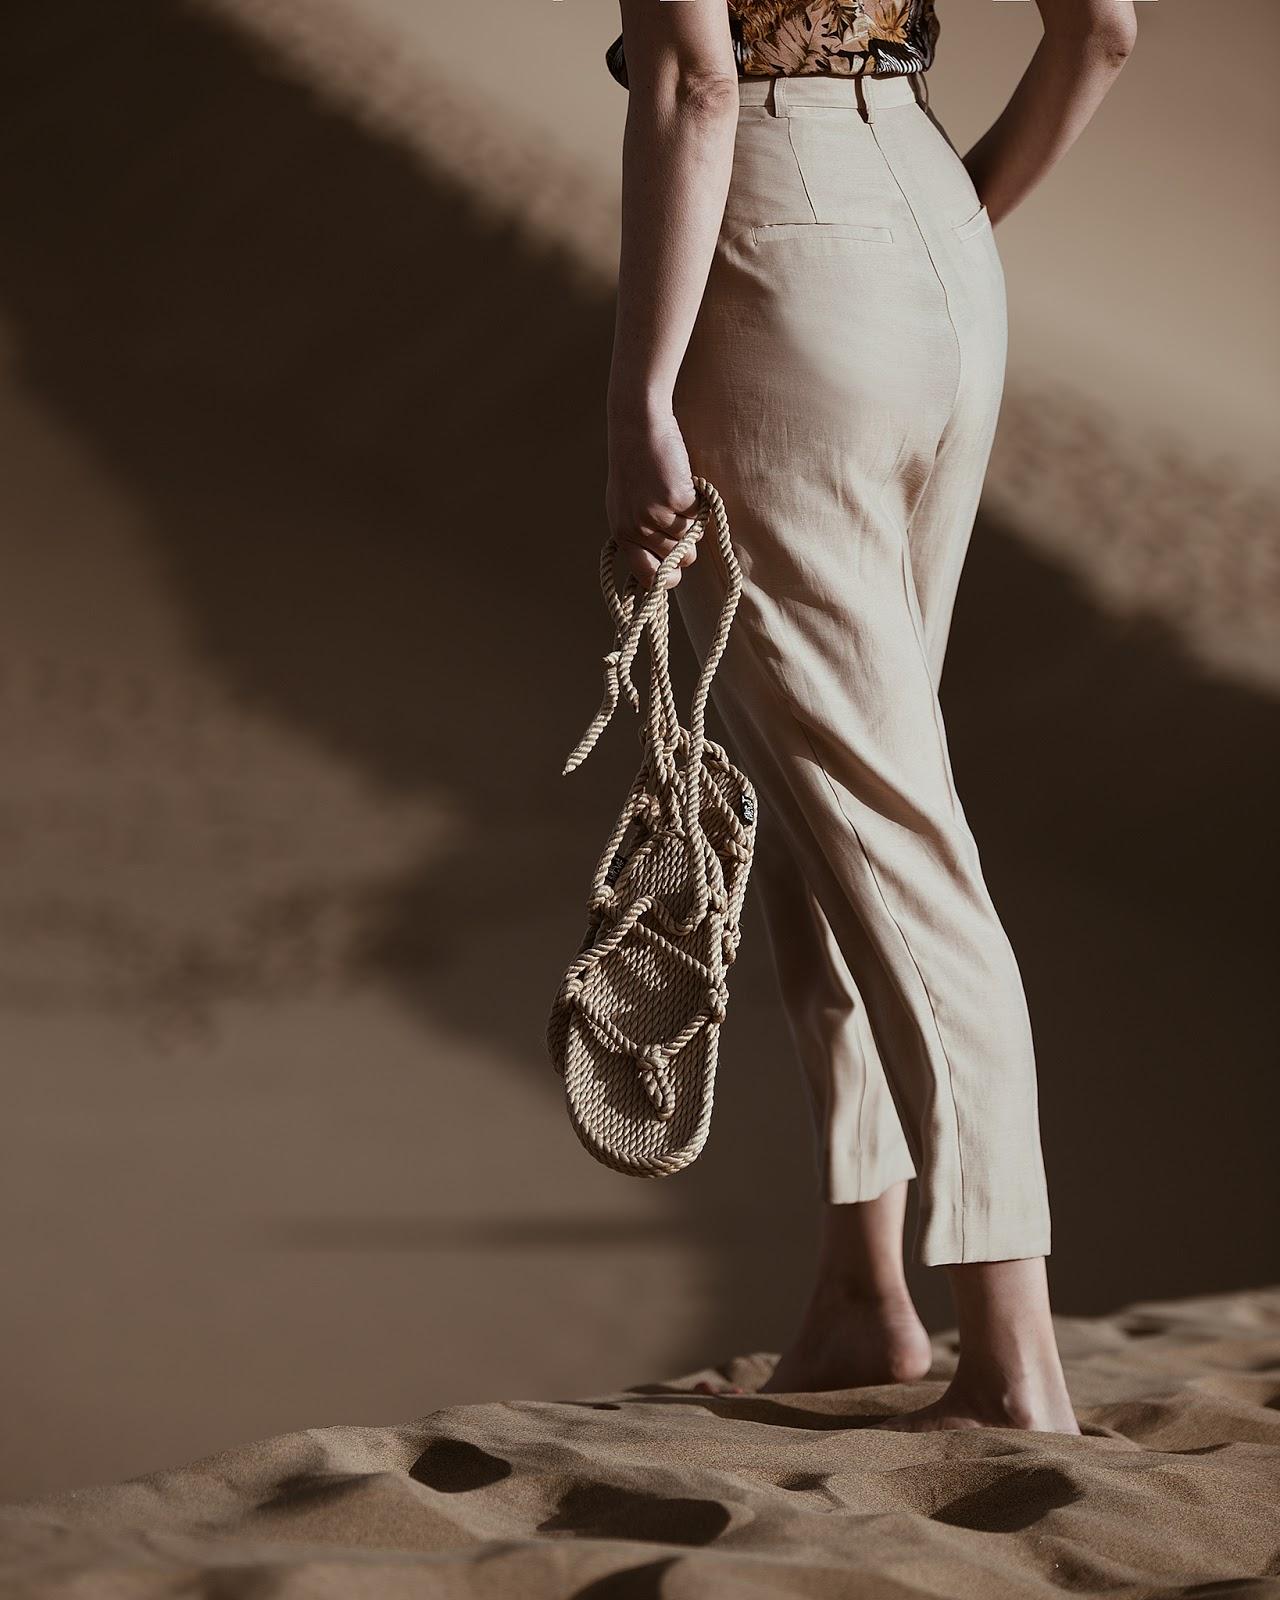 Wellness Laura Viaje By Gran Bloglovin' CanariaViews A My m0OvNwyn8